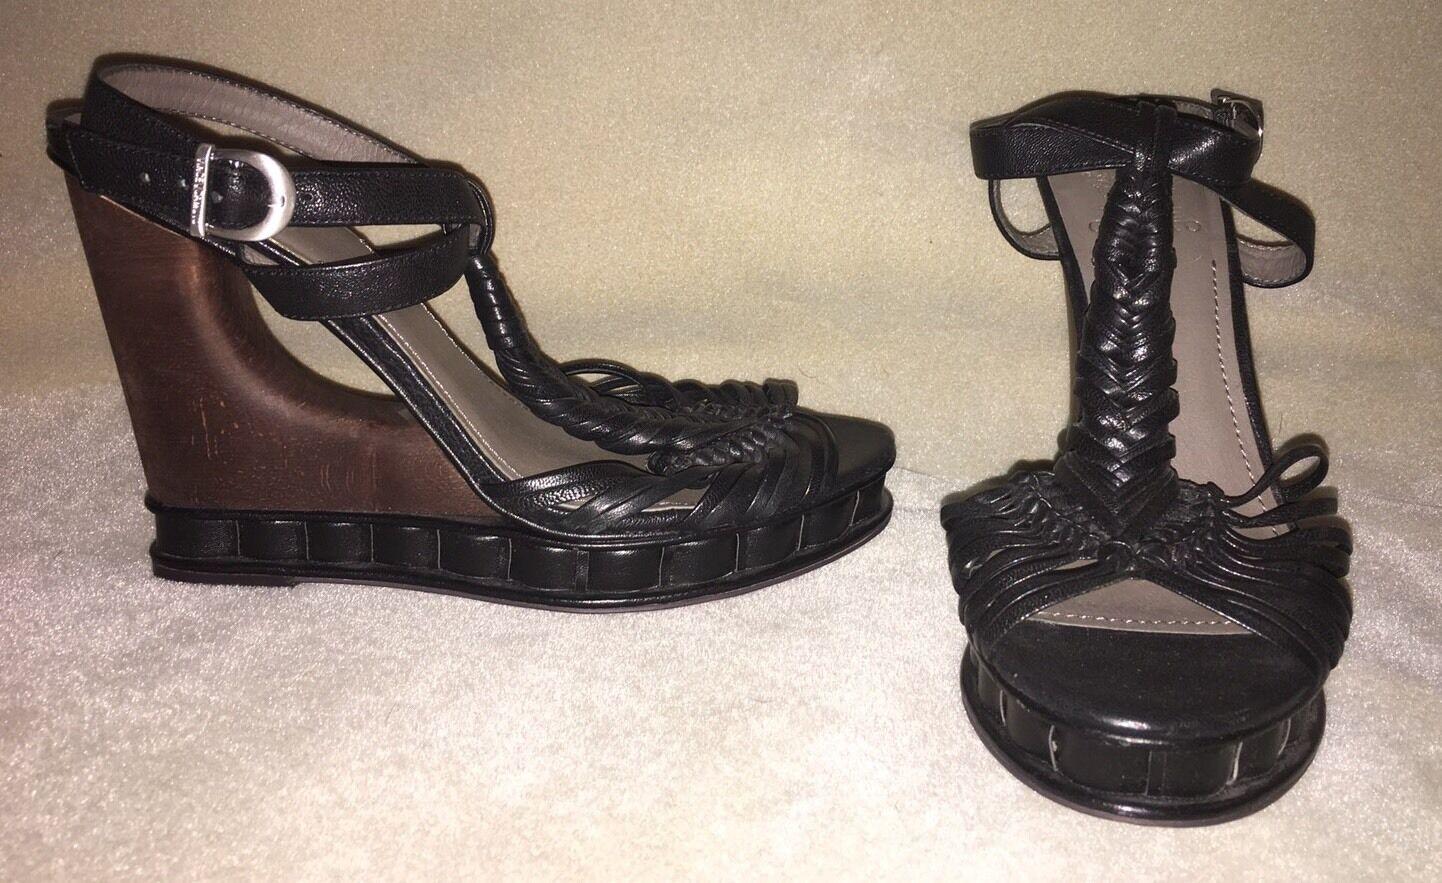 NEW Vince Camuto Dorian Wedge Wedge Wedge Sandals Sz 8 af78ac